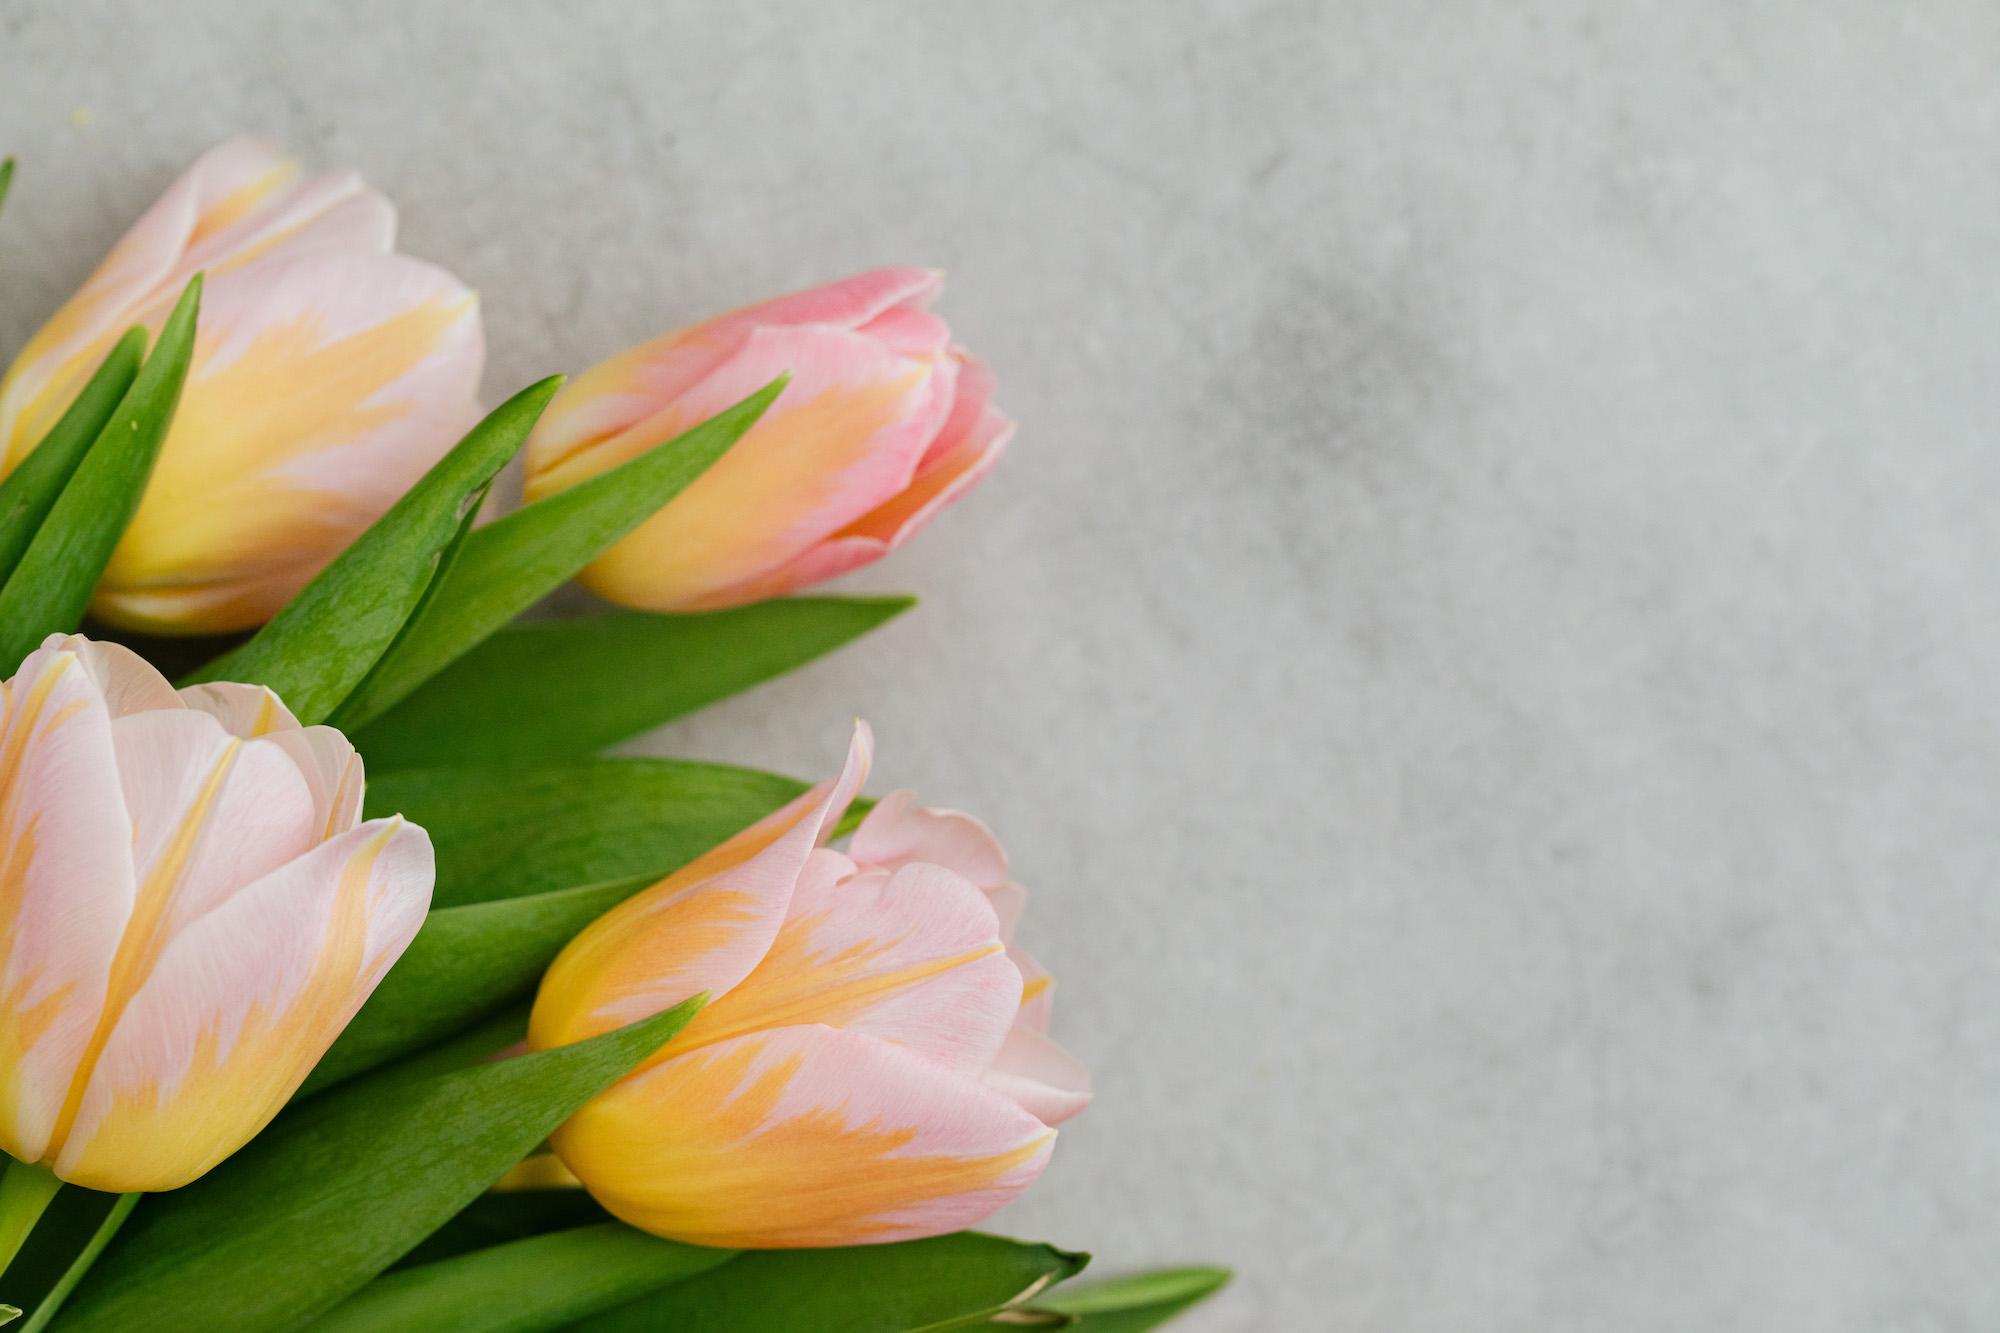 kaboompics_Pink and yellow tulips-r